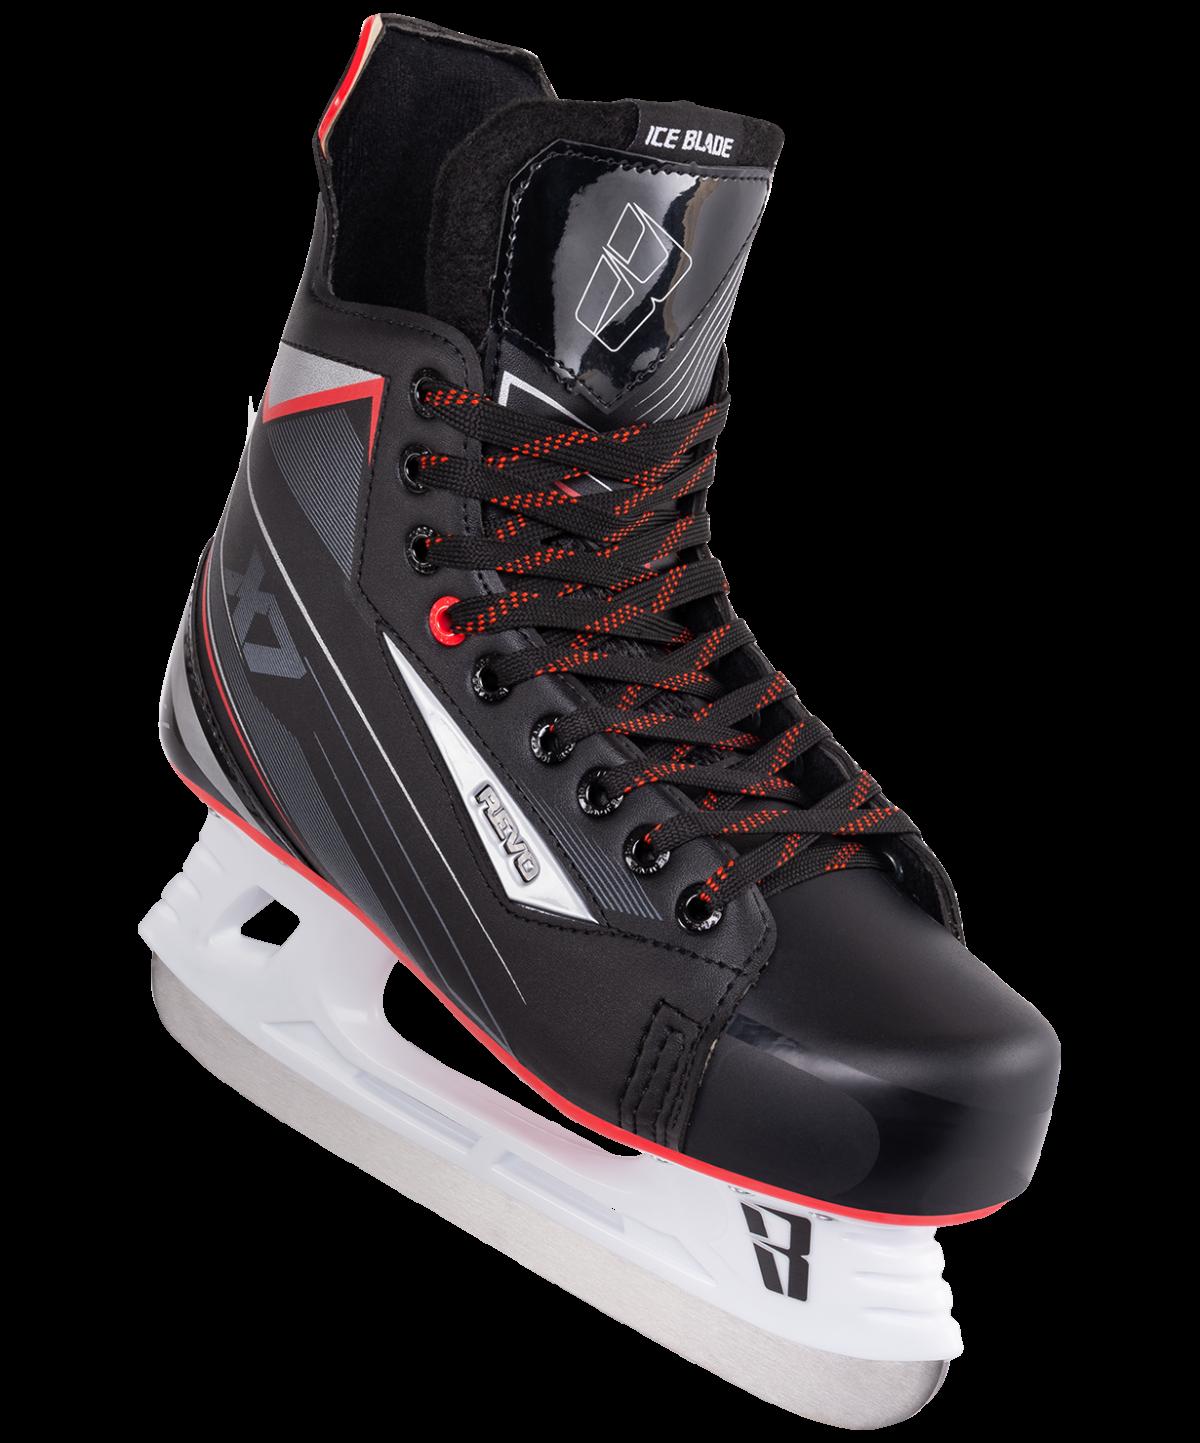 ICE BLADE Коньки хоккейные Revo Х7.0 - 3